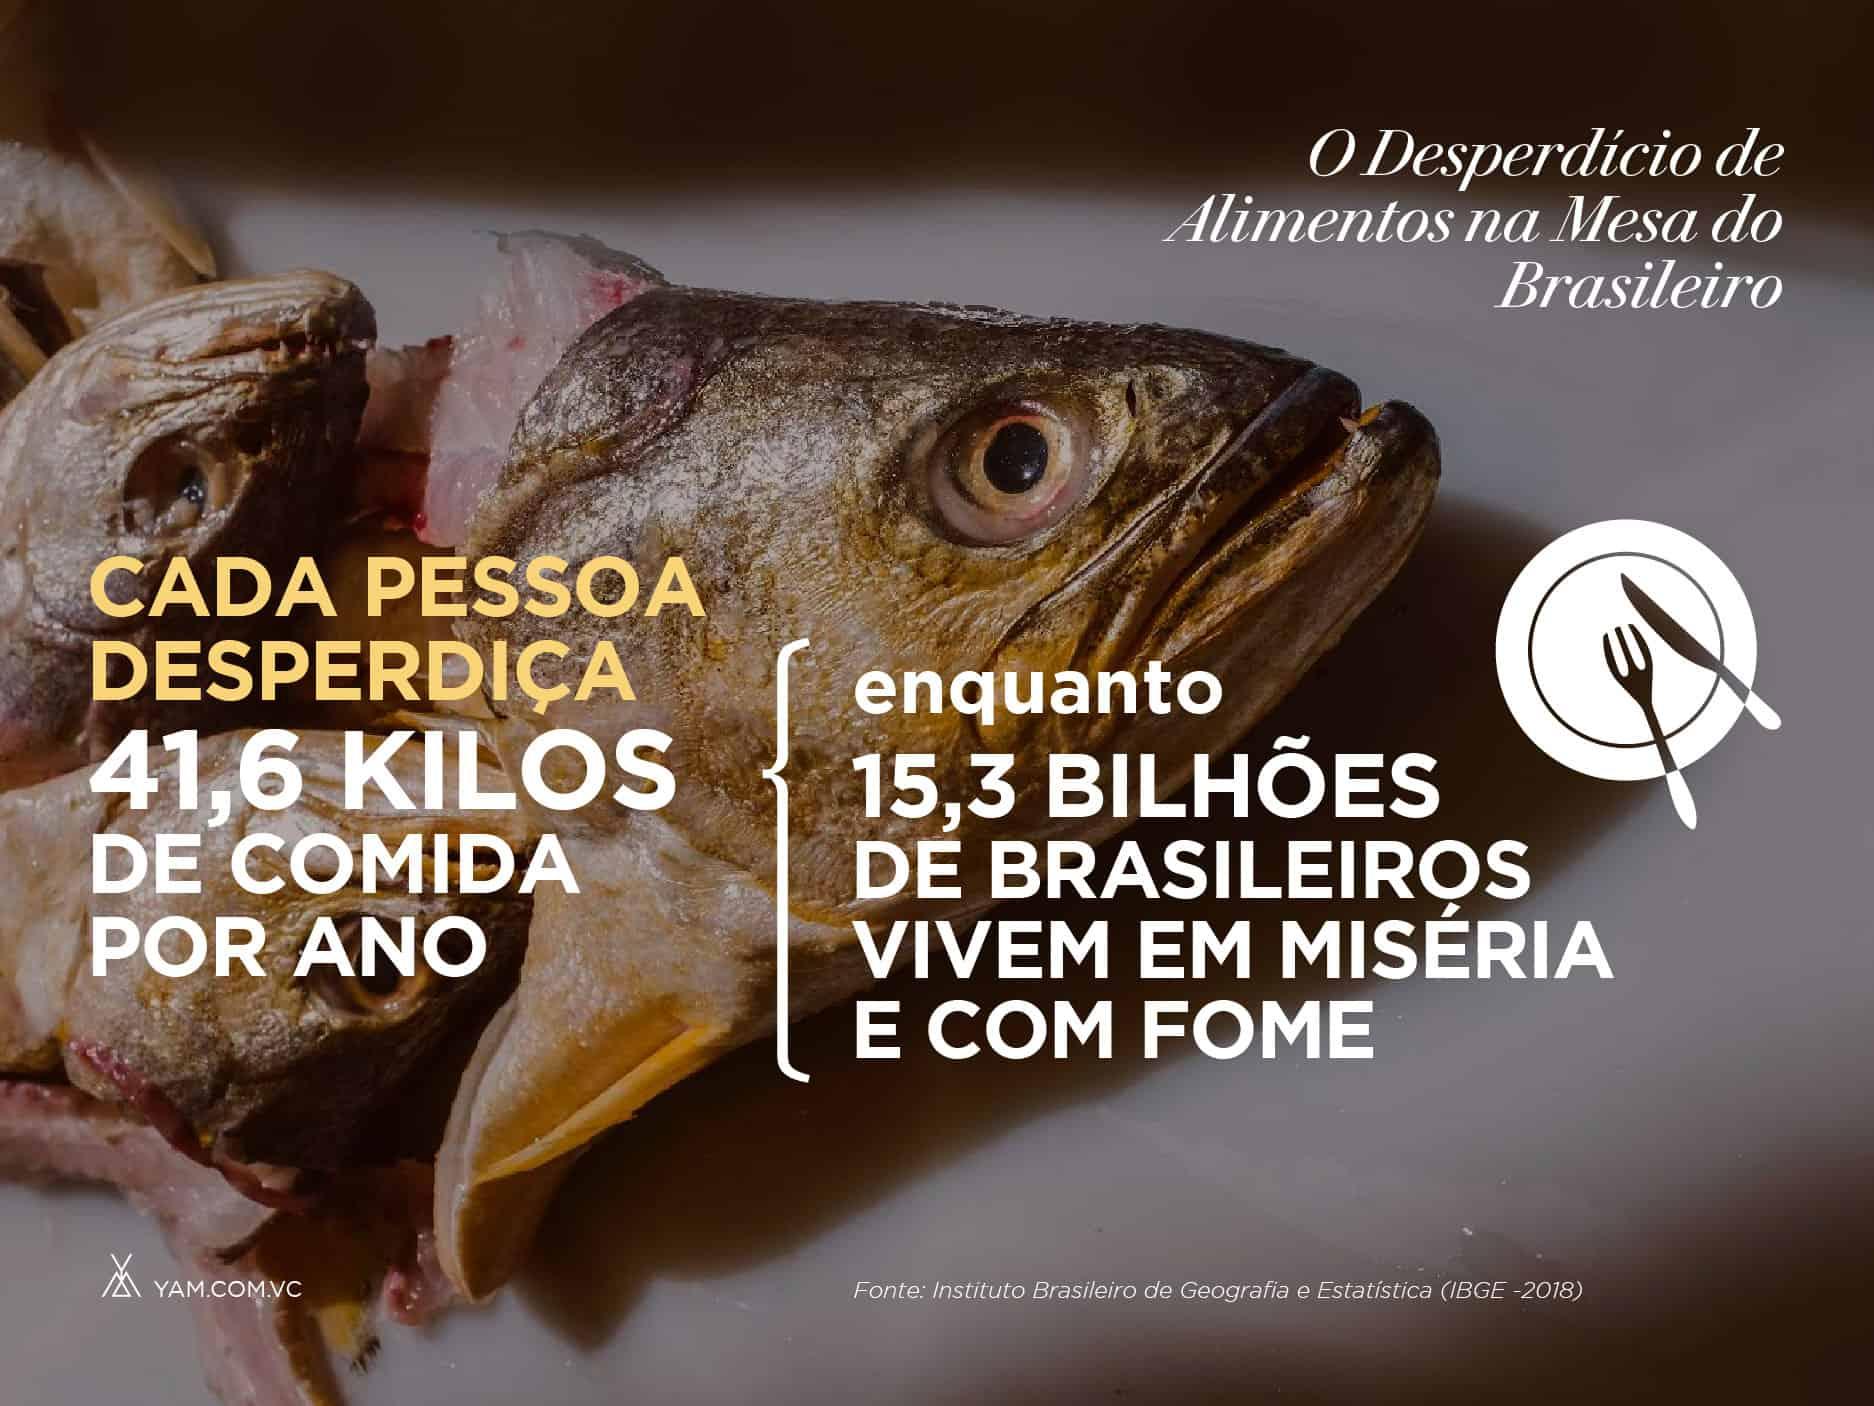 Números do desperdício de comida na mesa do brasileiro